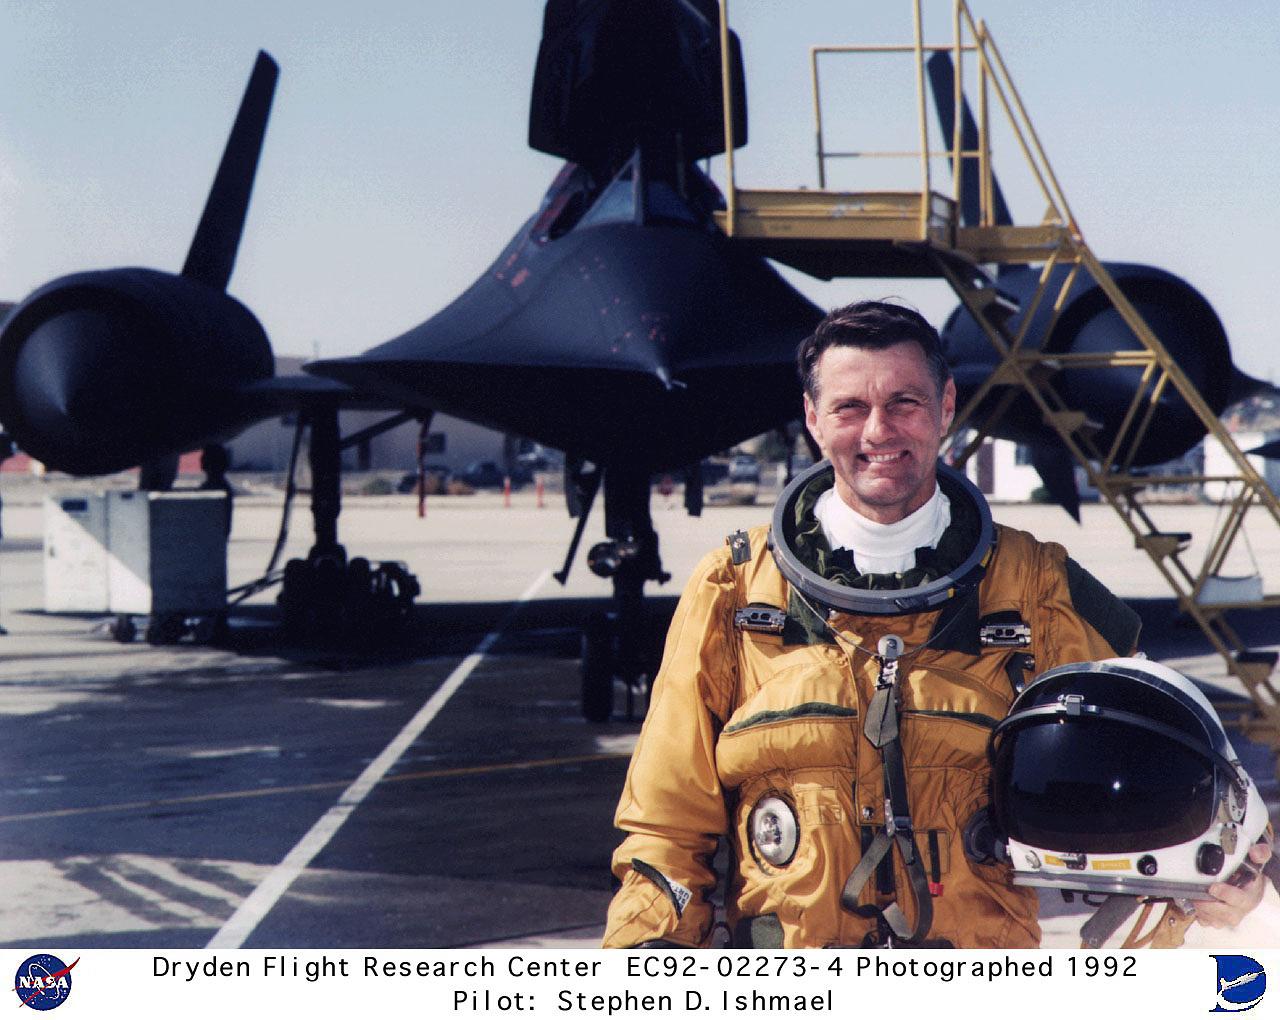 Former NASA X-15 Pilots Awarded Astronaut Wings